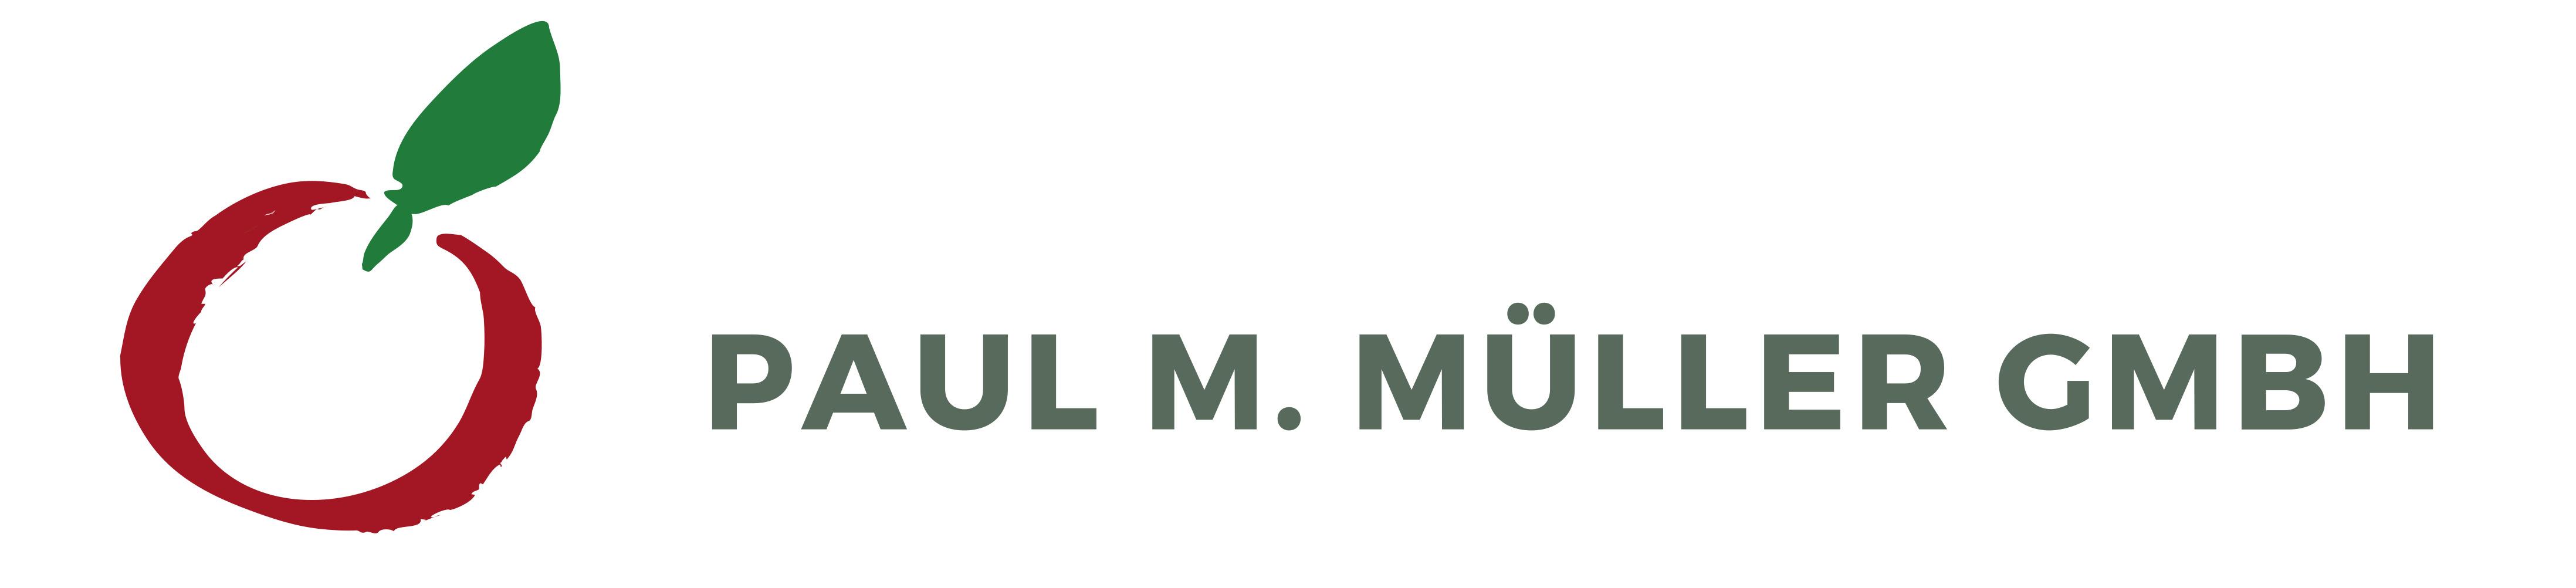 Paul M. Müller GmbH